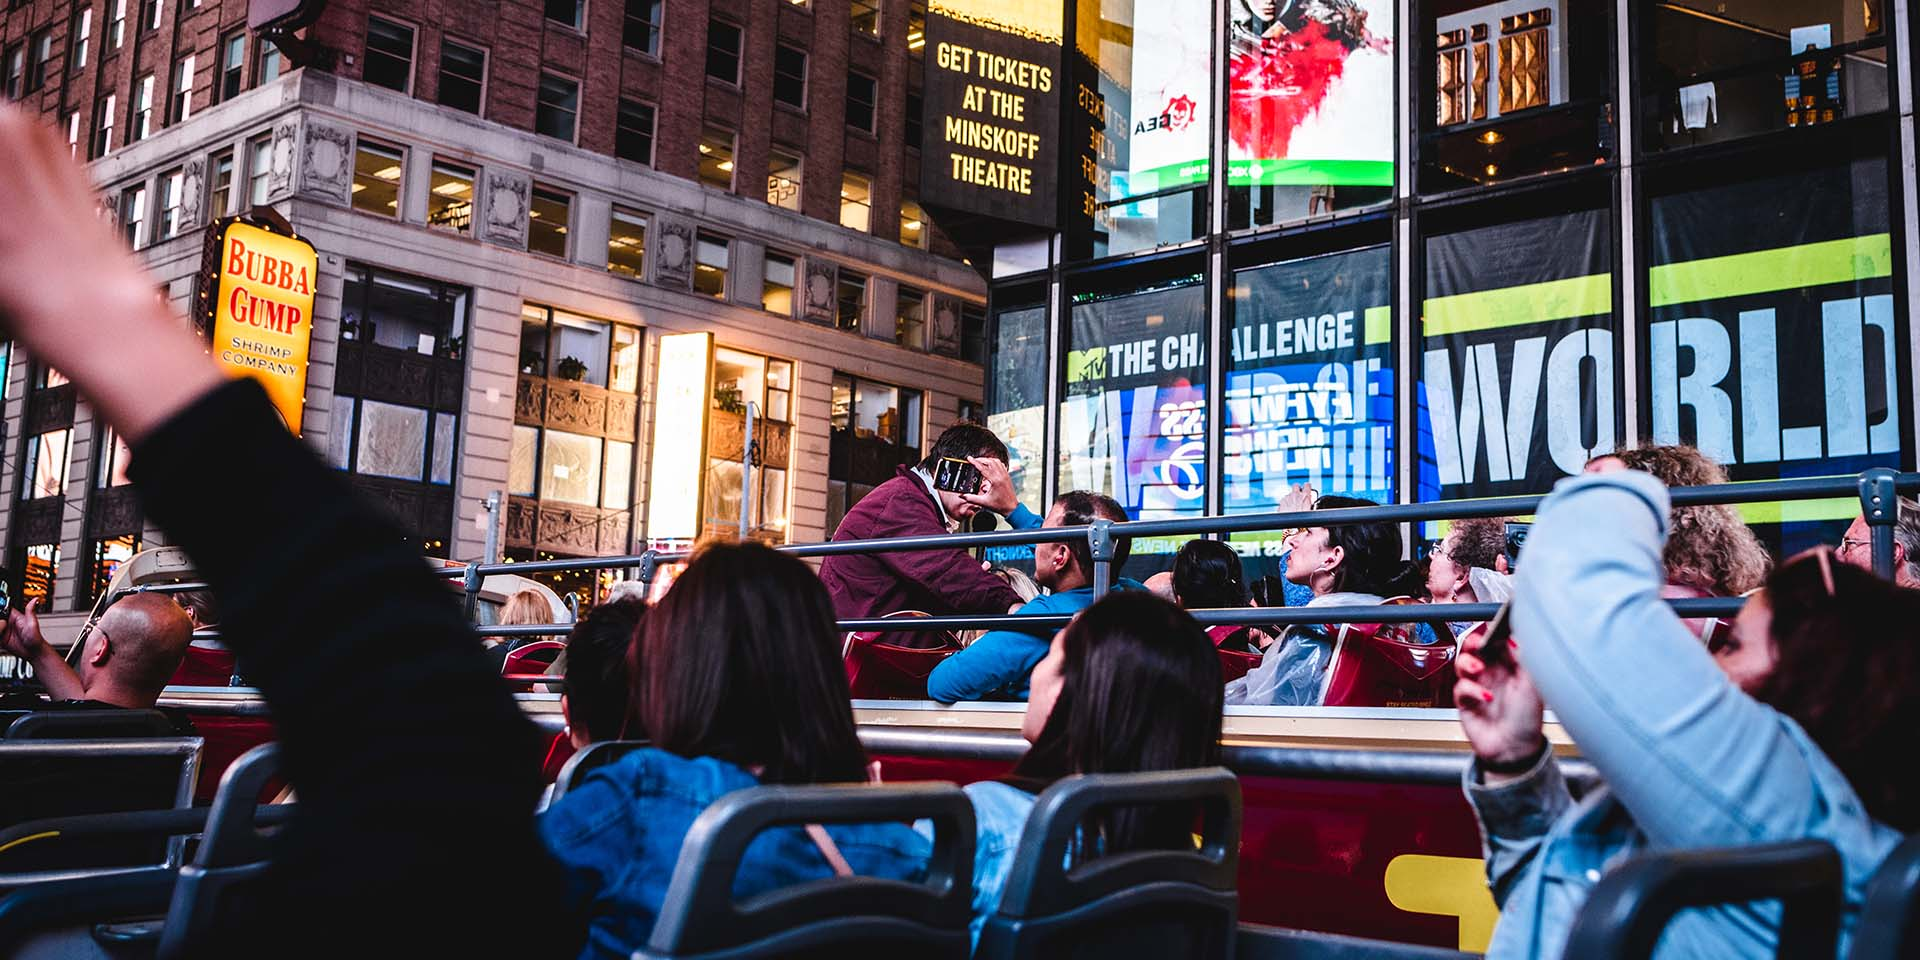 Best Night Bus Tour NYC Loving New York Reviews